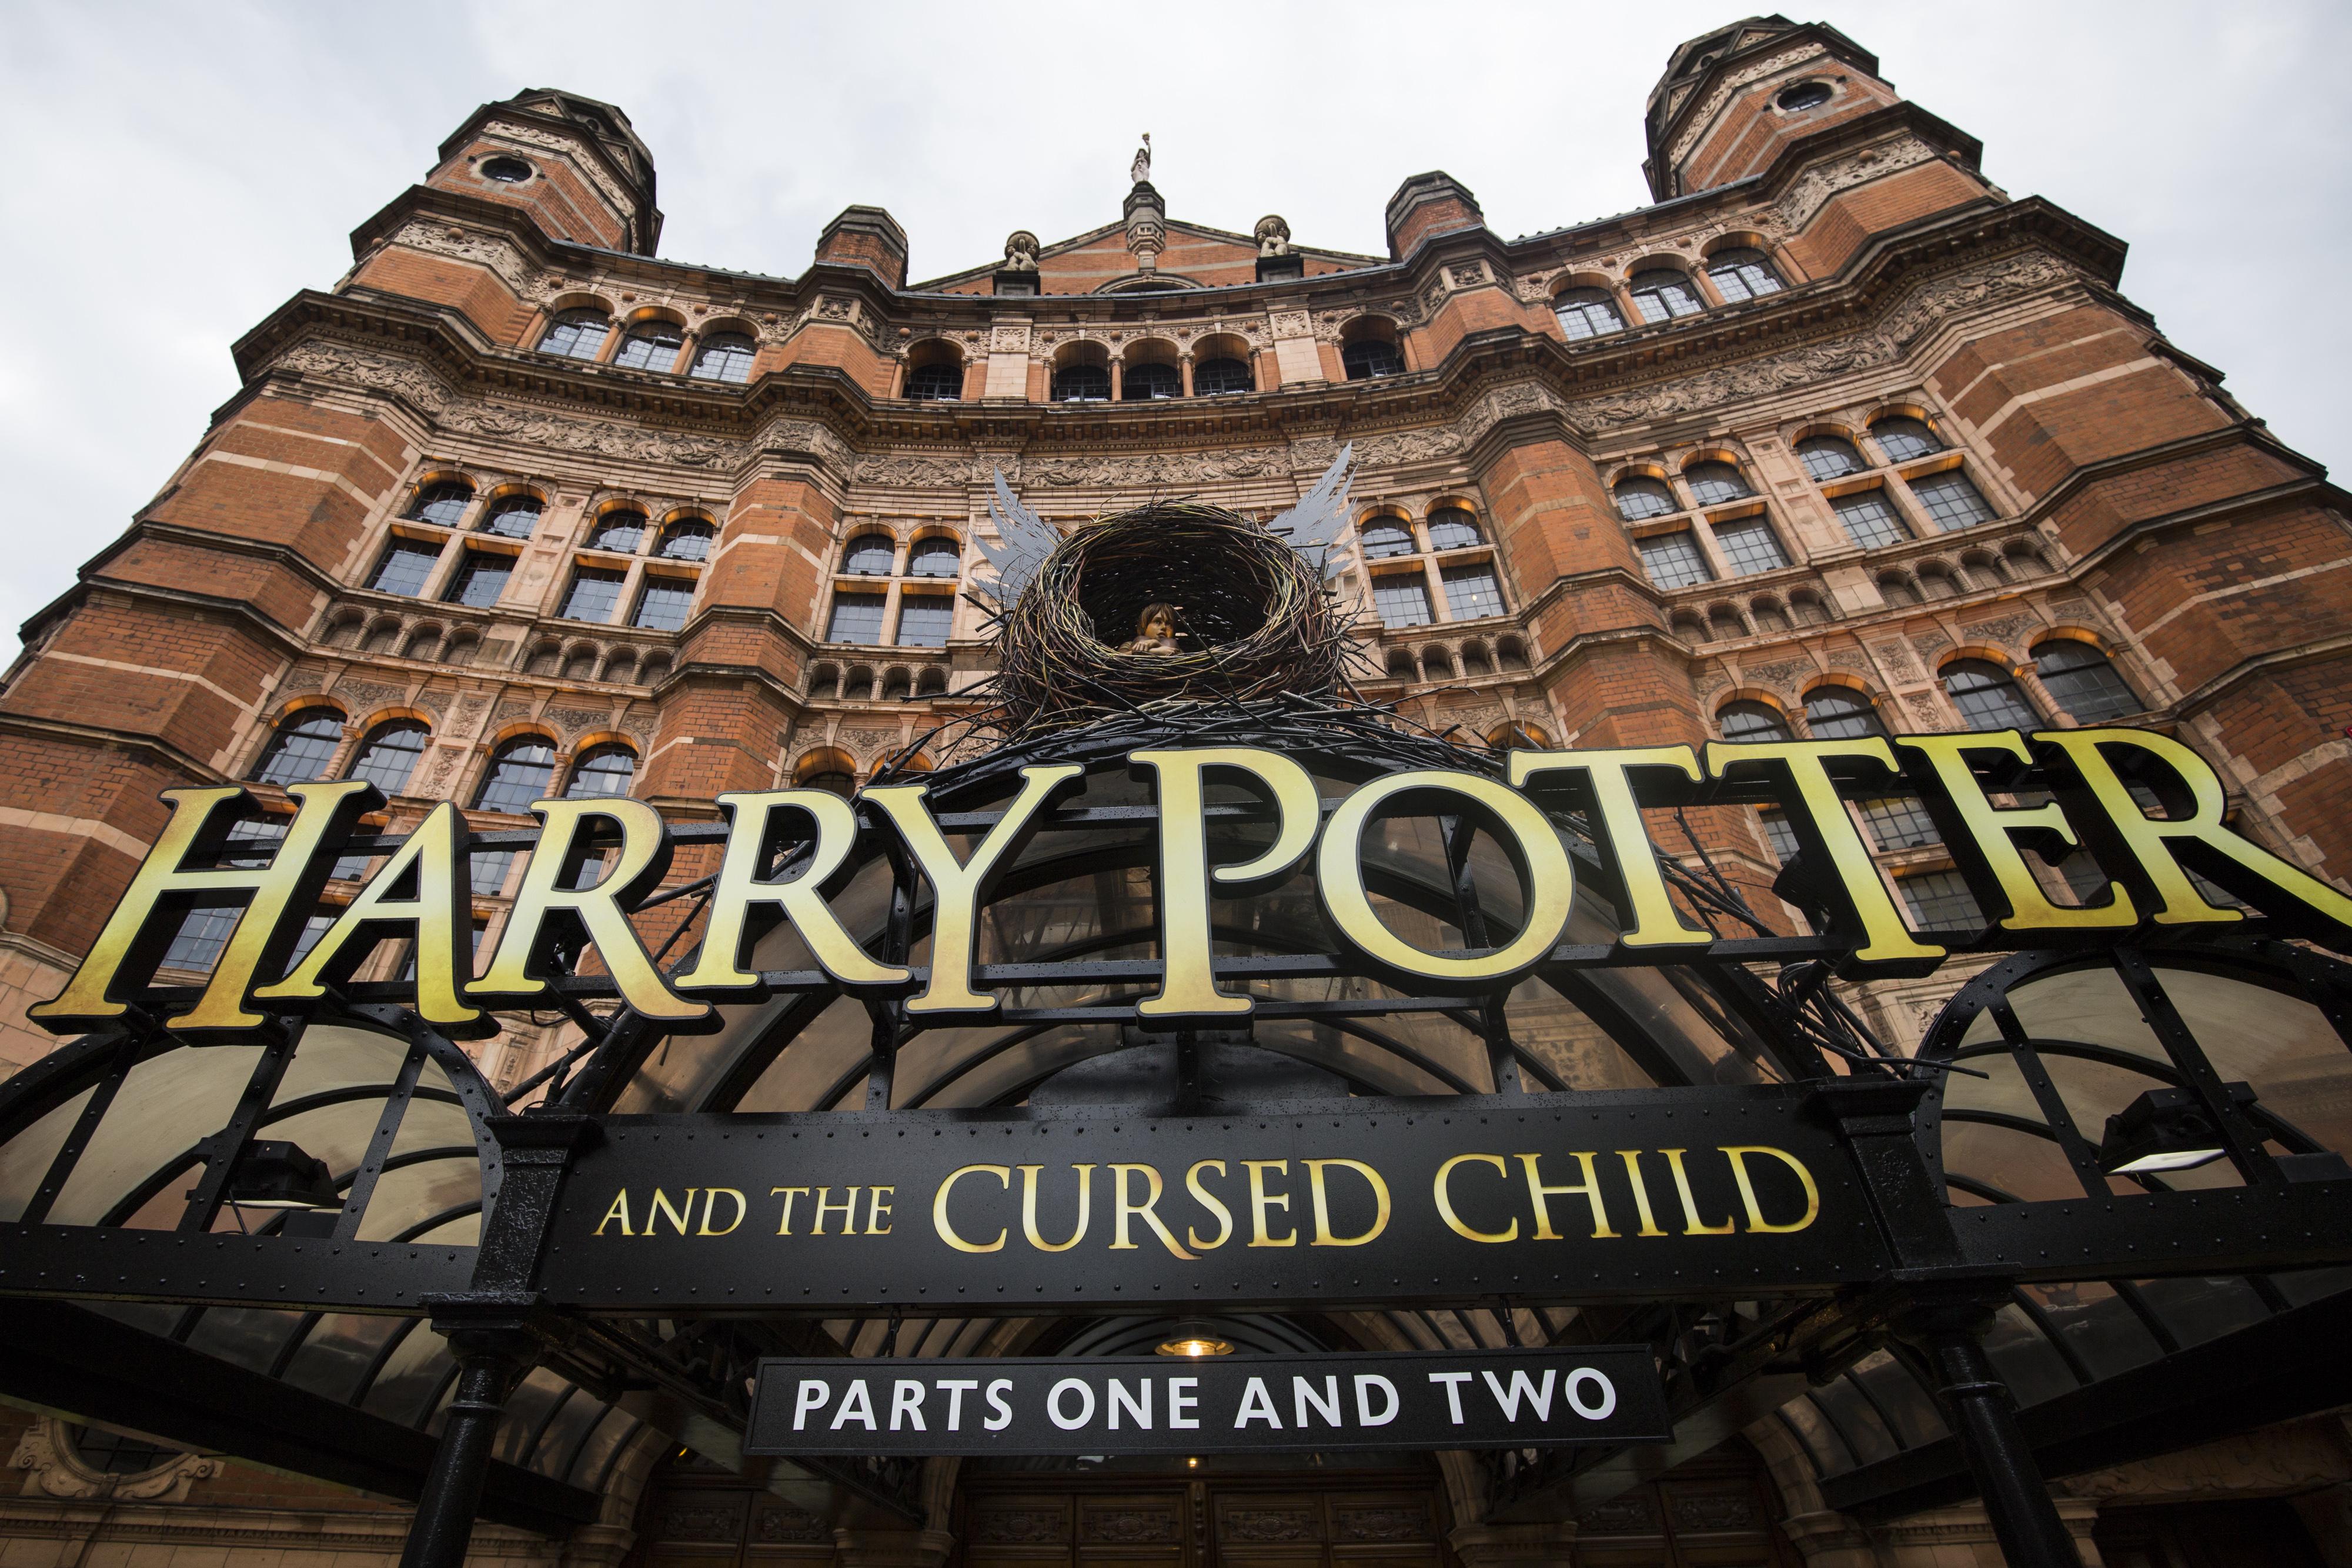 Harry Potter Cursed Child facade